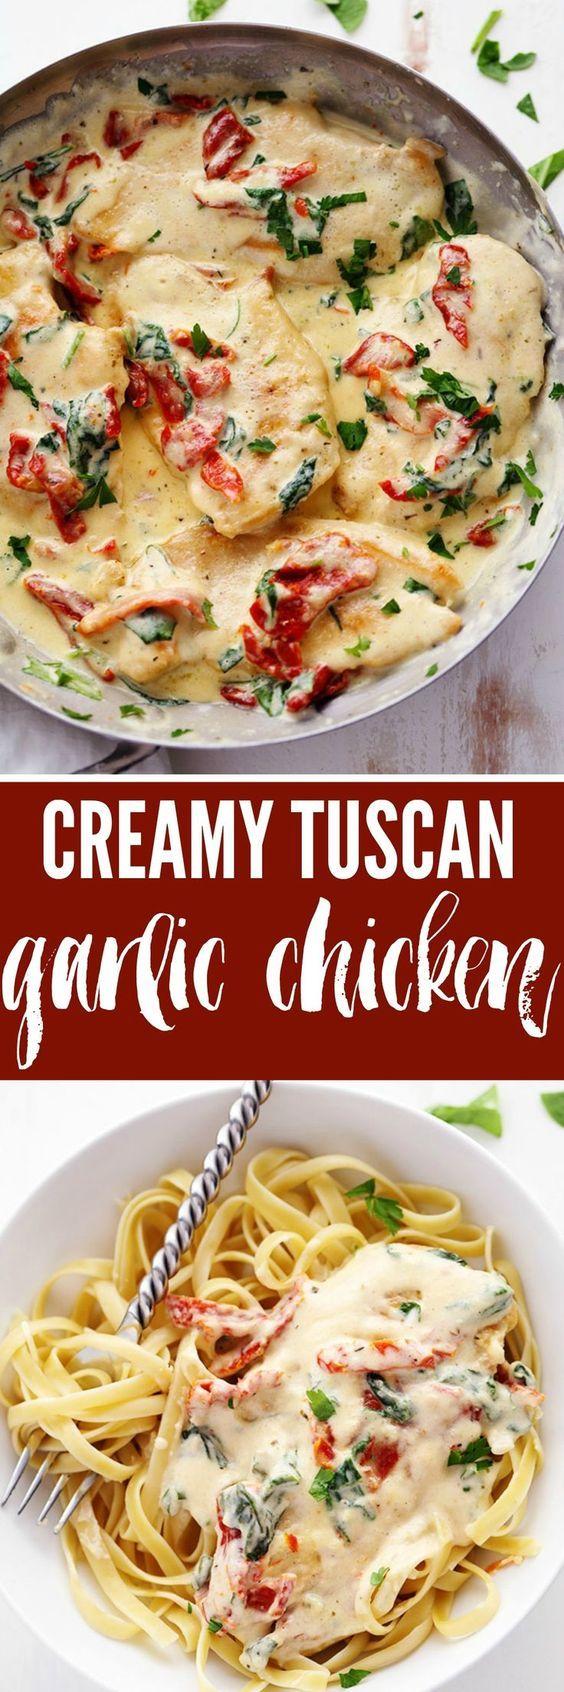 Creamy Tuscan Garlic Chicken has the most amazing creamy garlic sauce with…